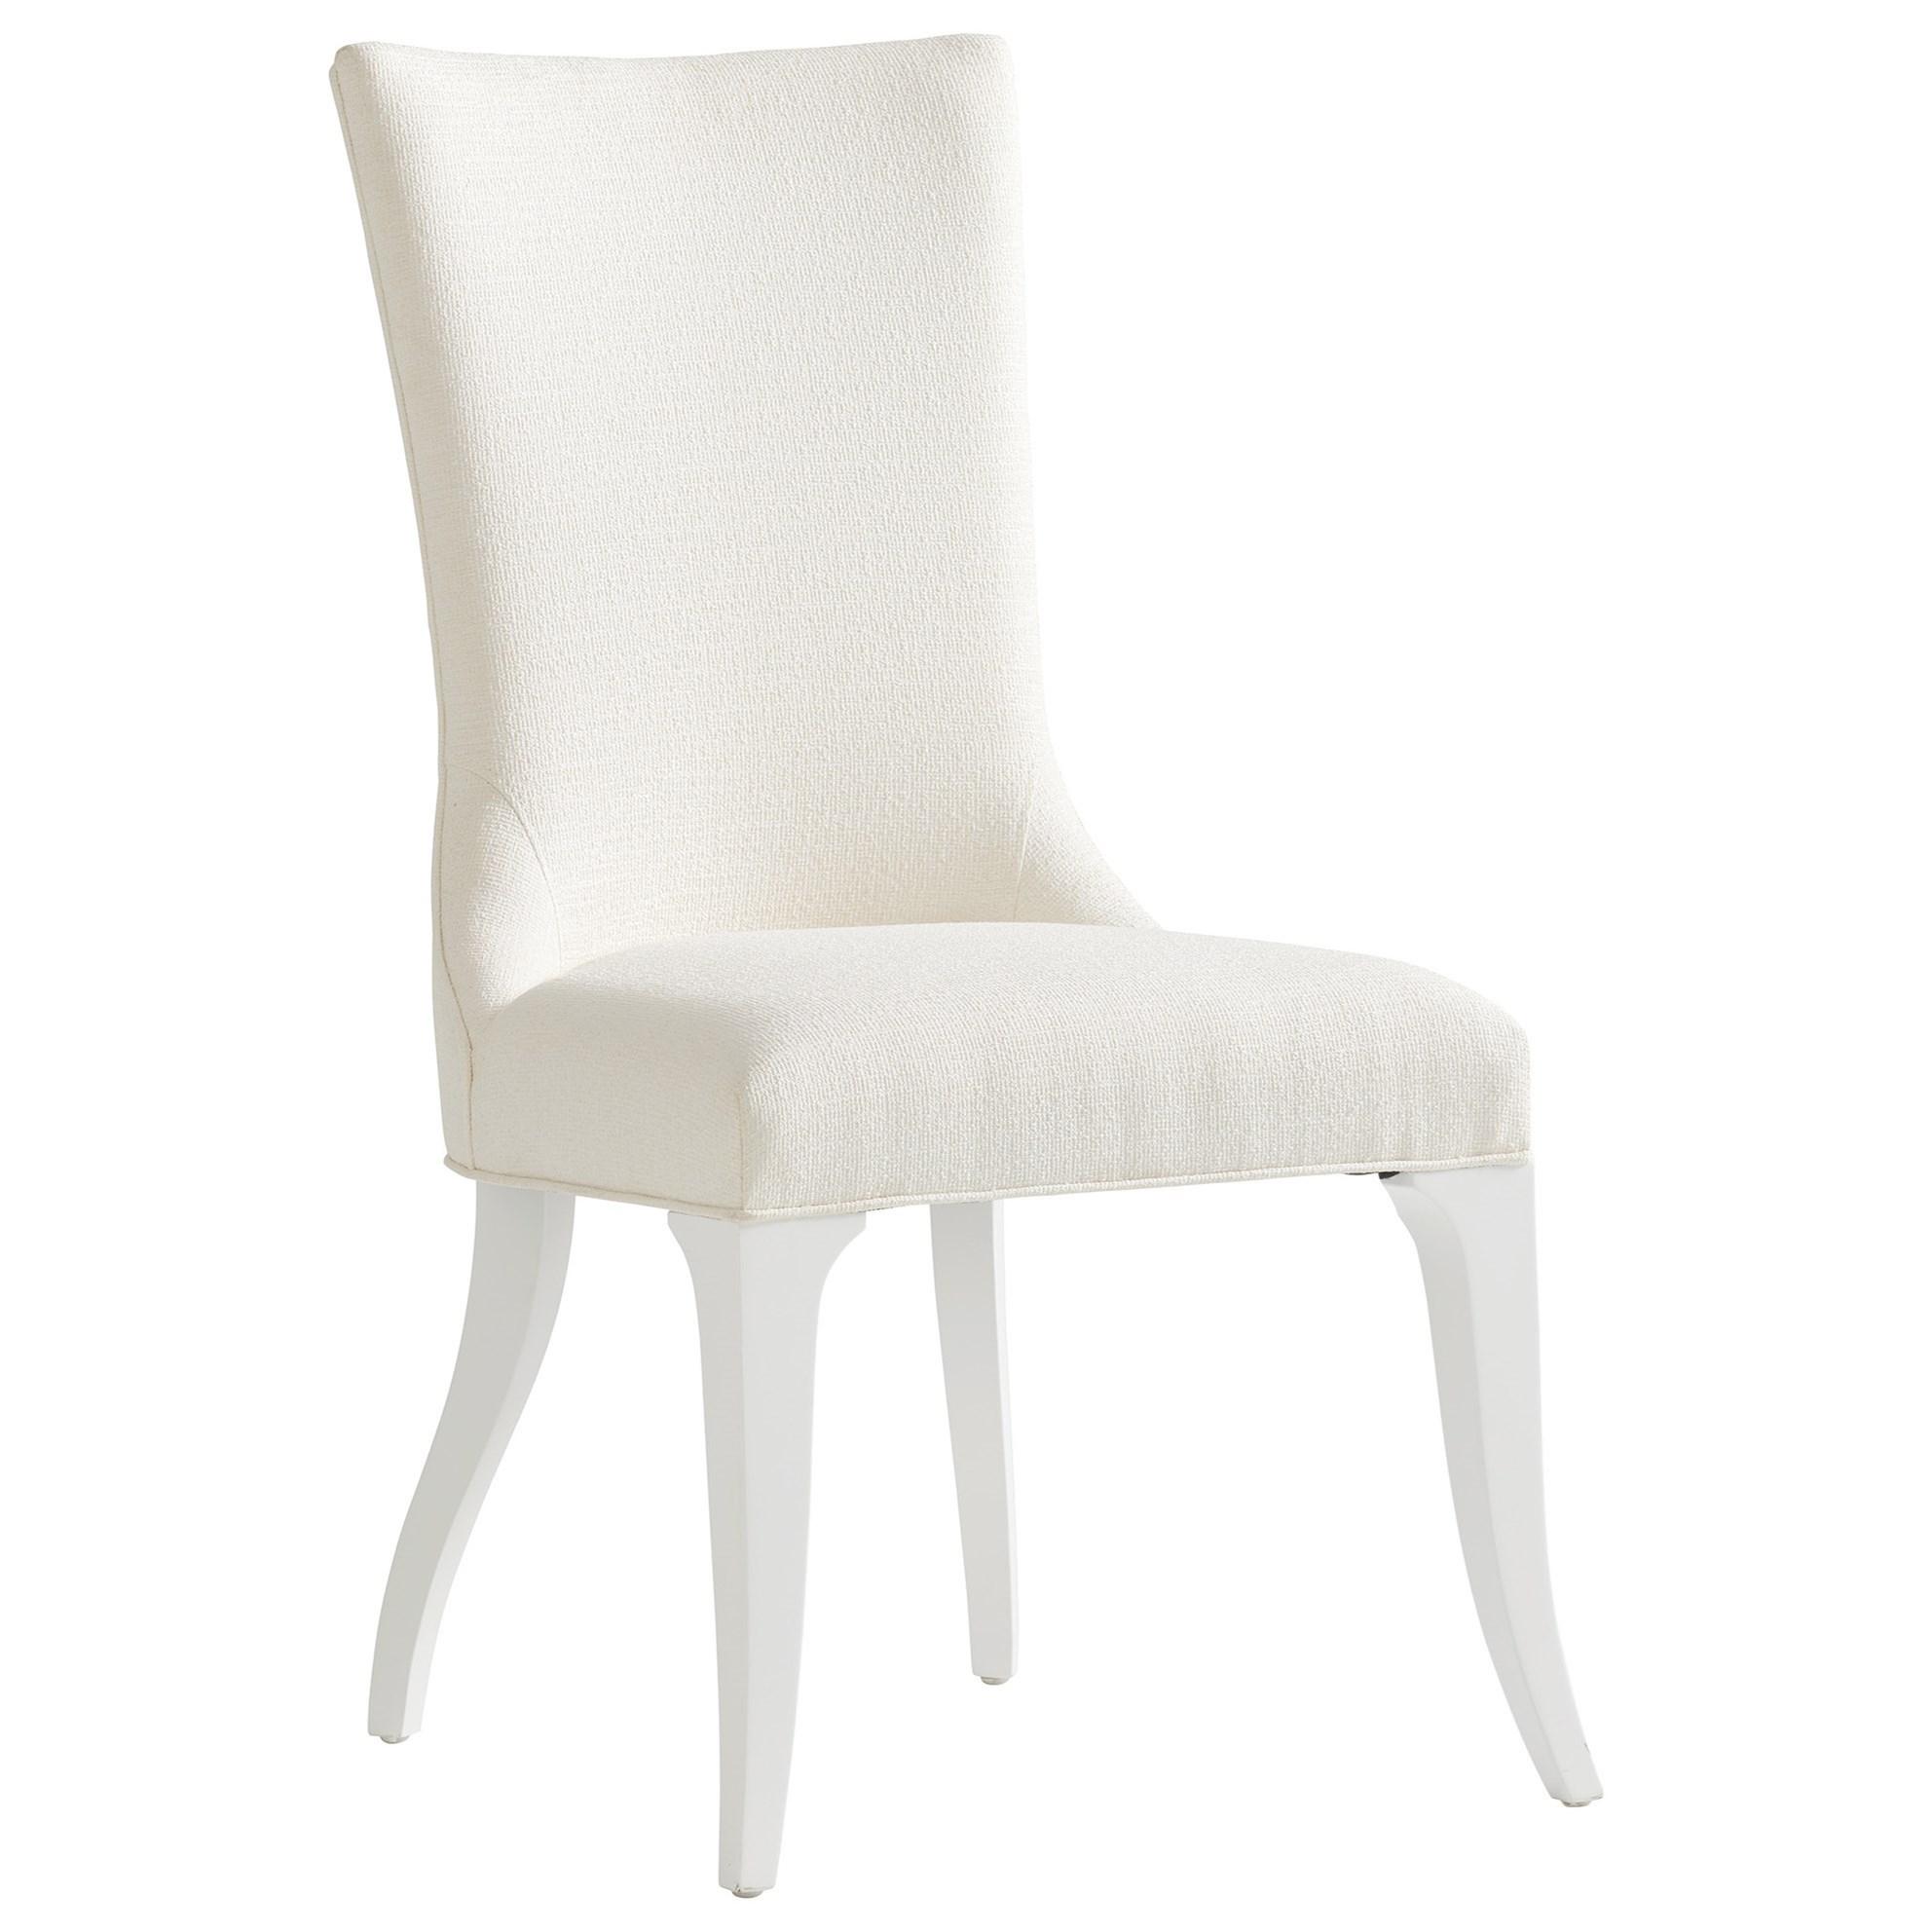 Avondale Geneva Upholstered Side Chair by Lexington at Fisher Home Furnishings